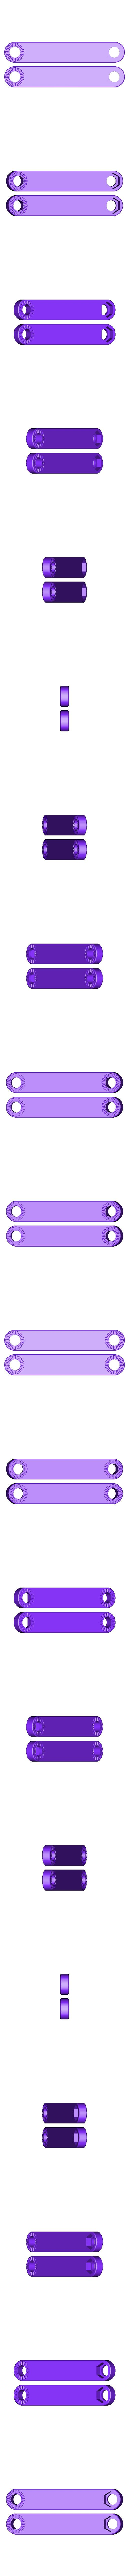 Arm First v1.stl Télécharger fichier STL gratuit LiftPod - Support pliable multifonctionnel • Objet à imprimer en 3D, HeyVye